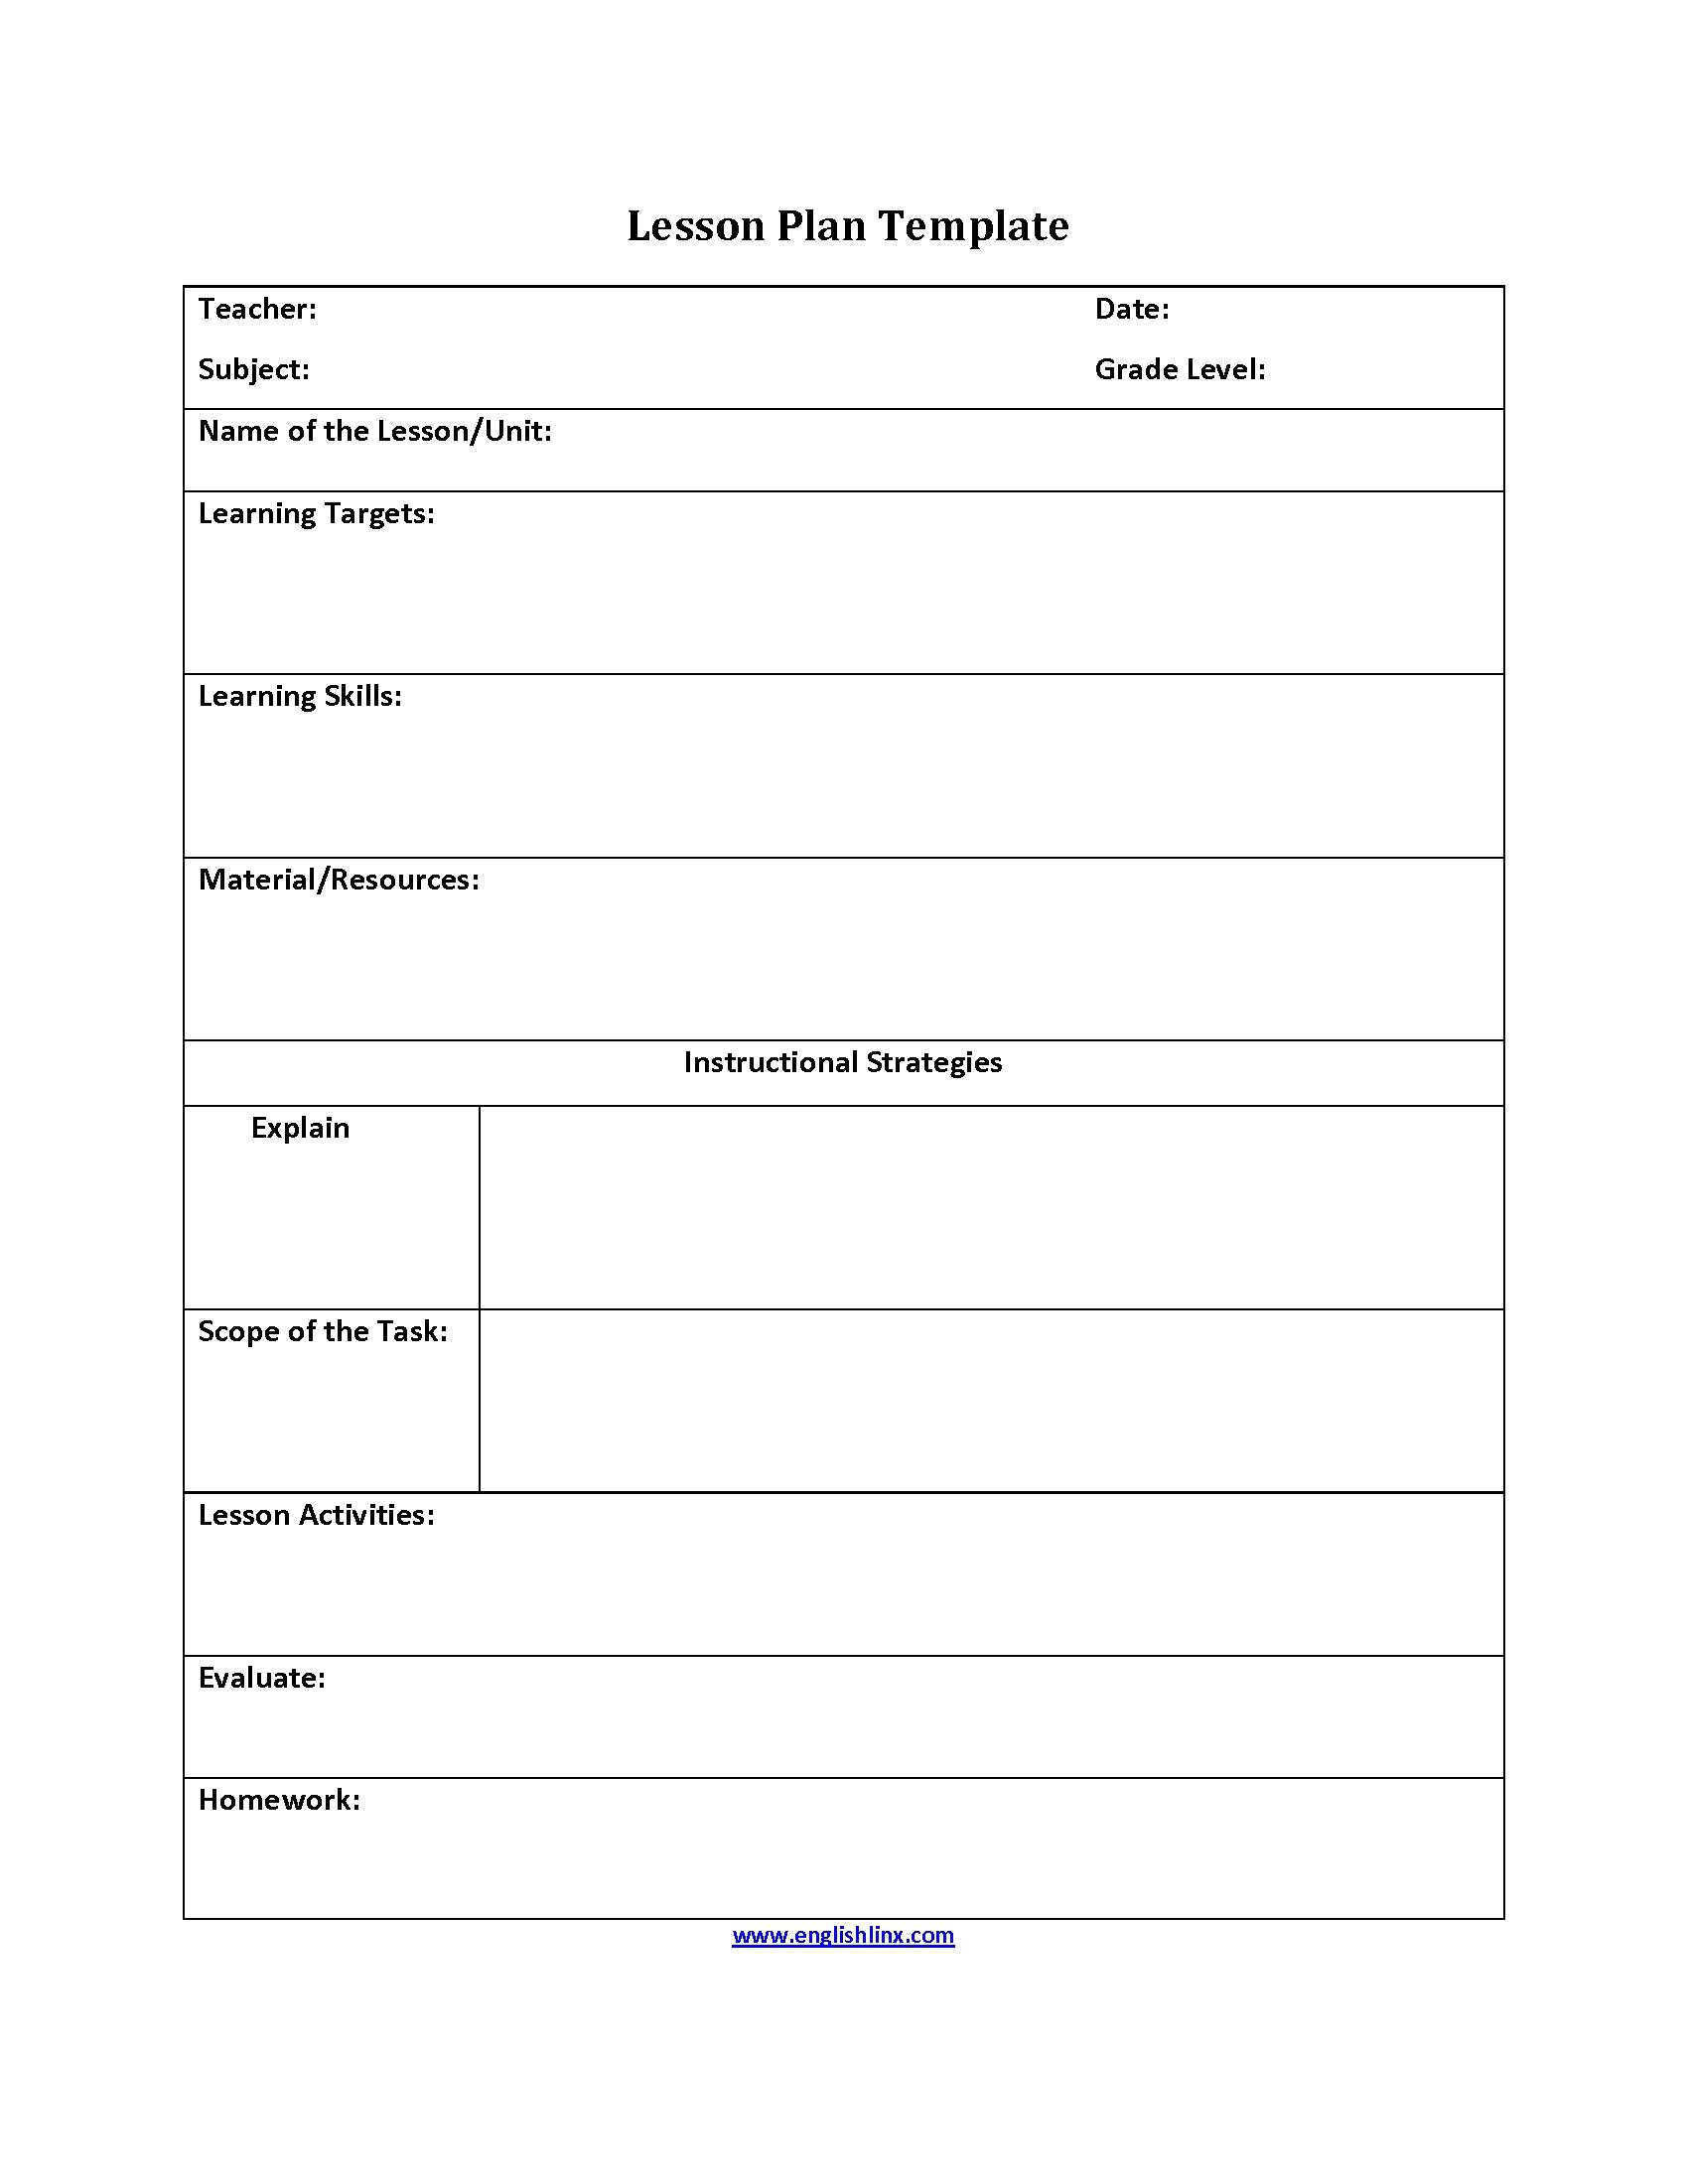 Englishlinx | Lesson Plan Template pertaining to Speech Language Lesson Plan Template